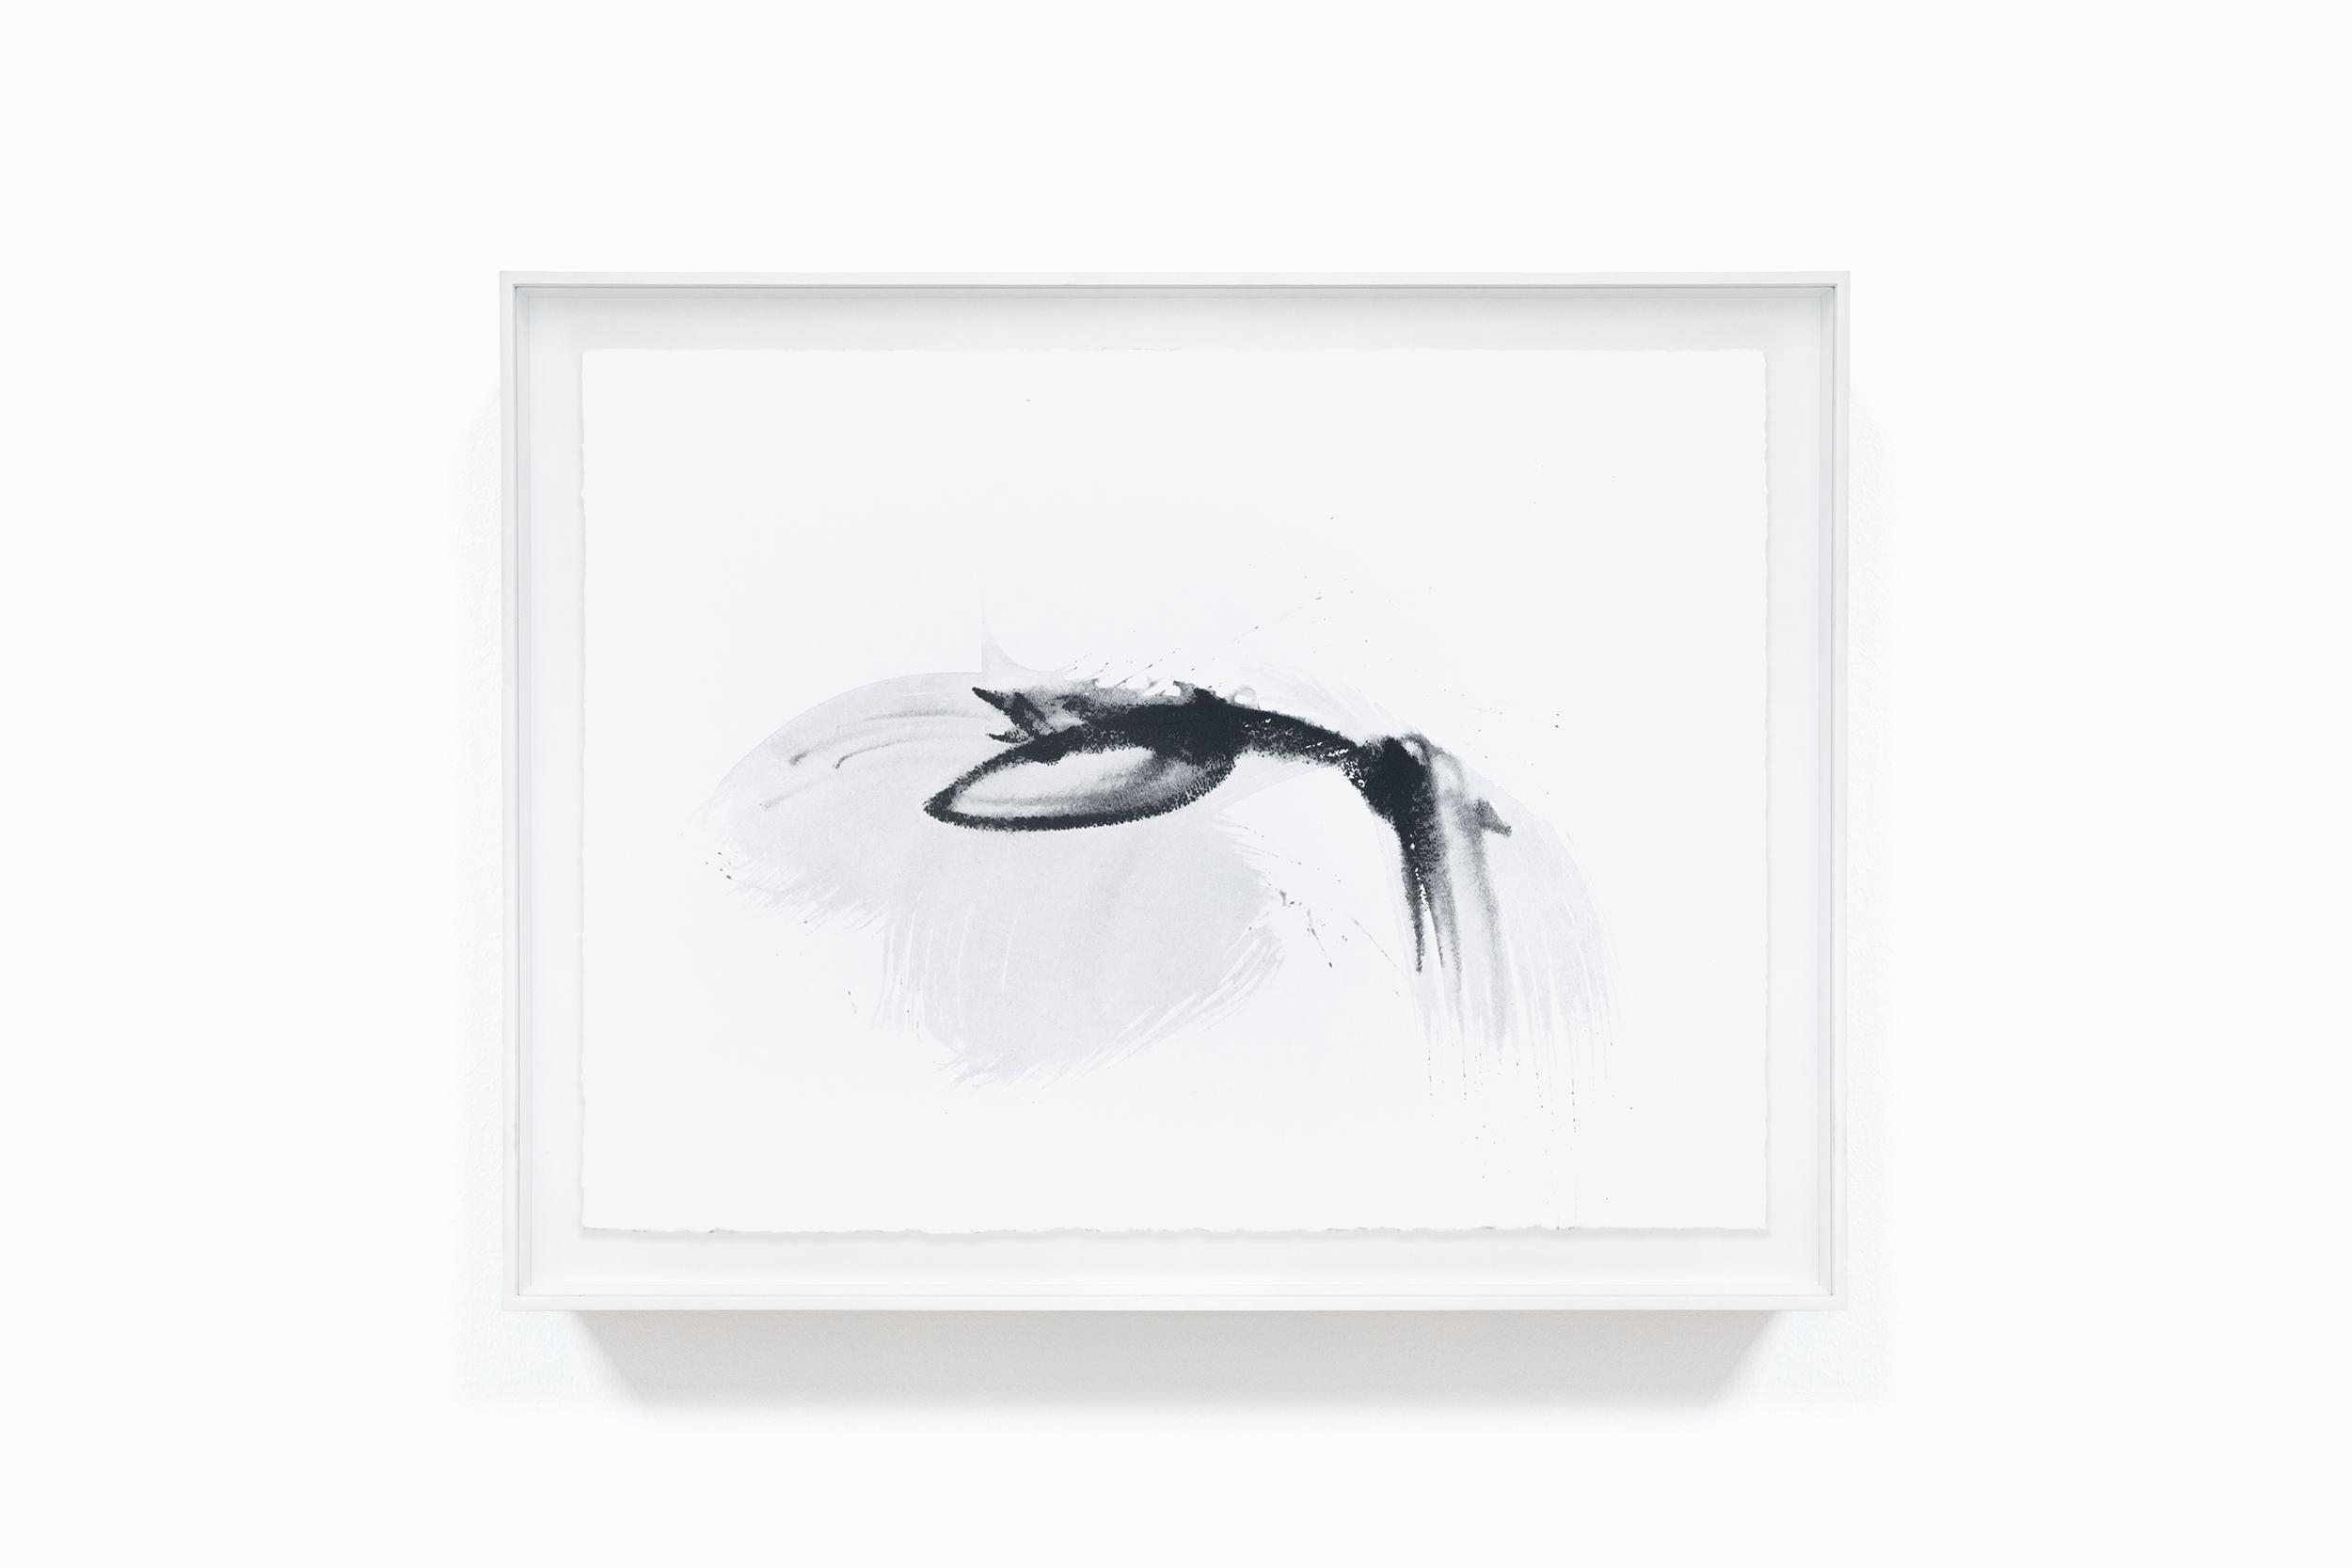 098 Andre Gigante Pintura Painting bonjourmolotov La.jpg